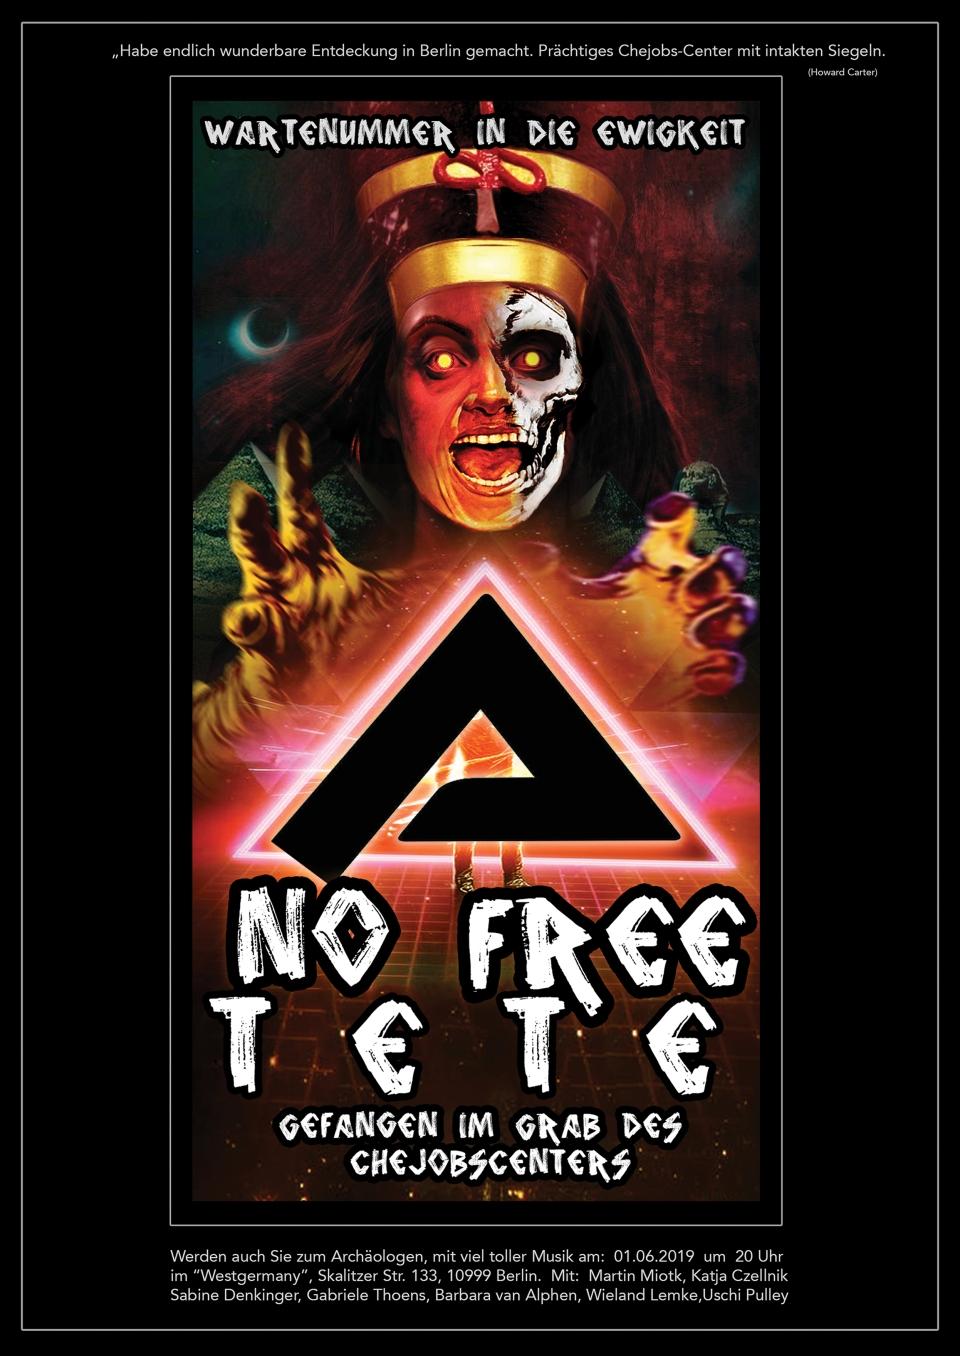 poster no free tete A2 150dpi.jpg